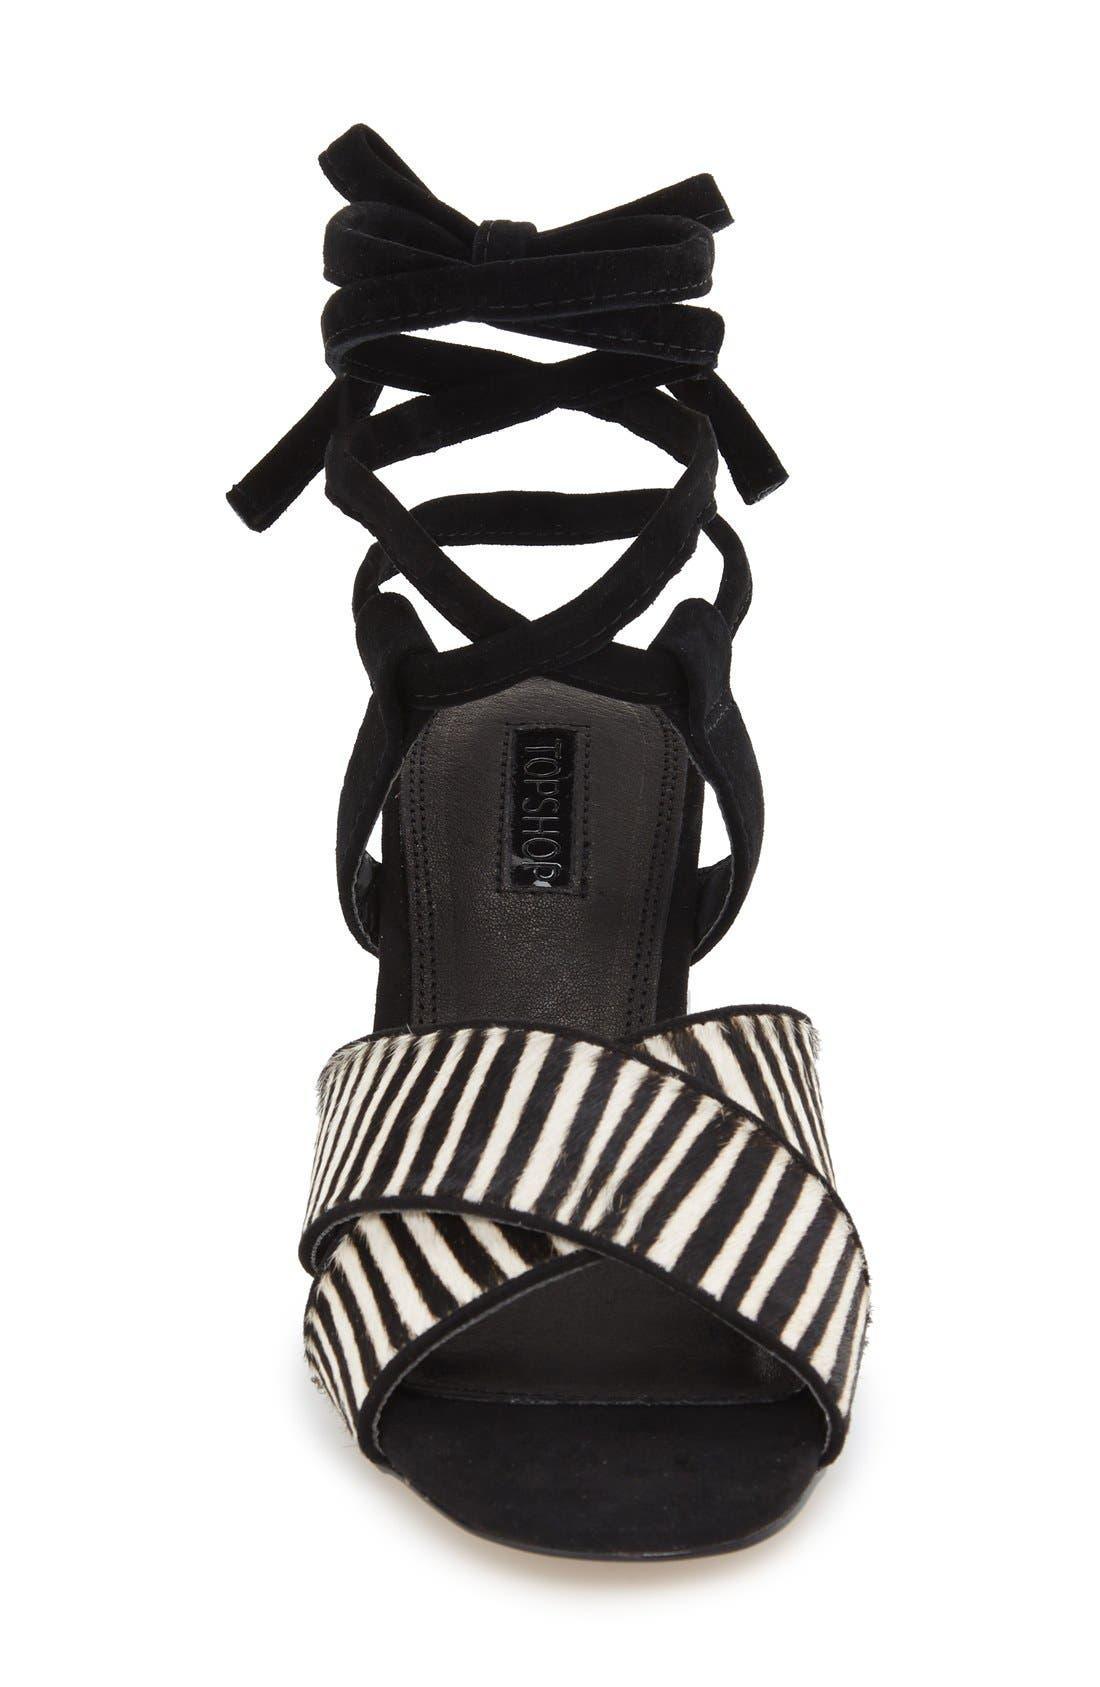 TOPSHOP,                             'Raffle' Ankle Strap Sandal,                             Alternate thumbnail 3, color,                             001